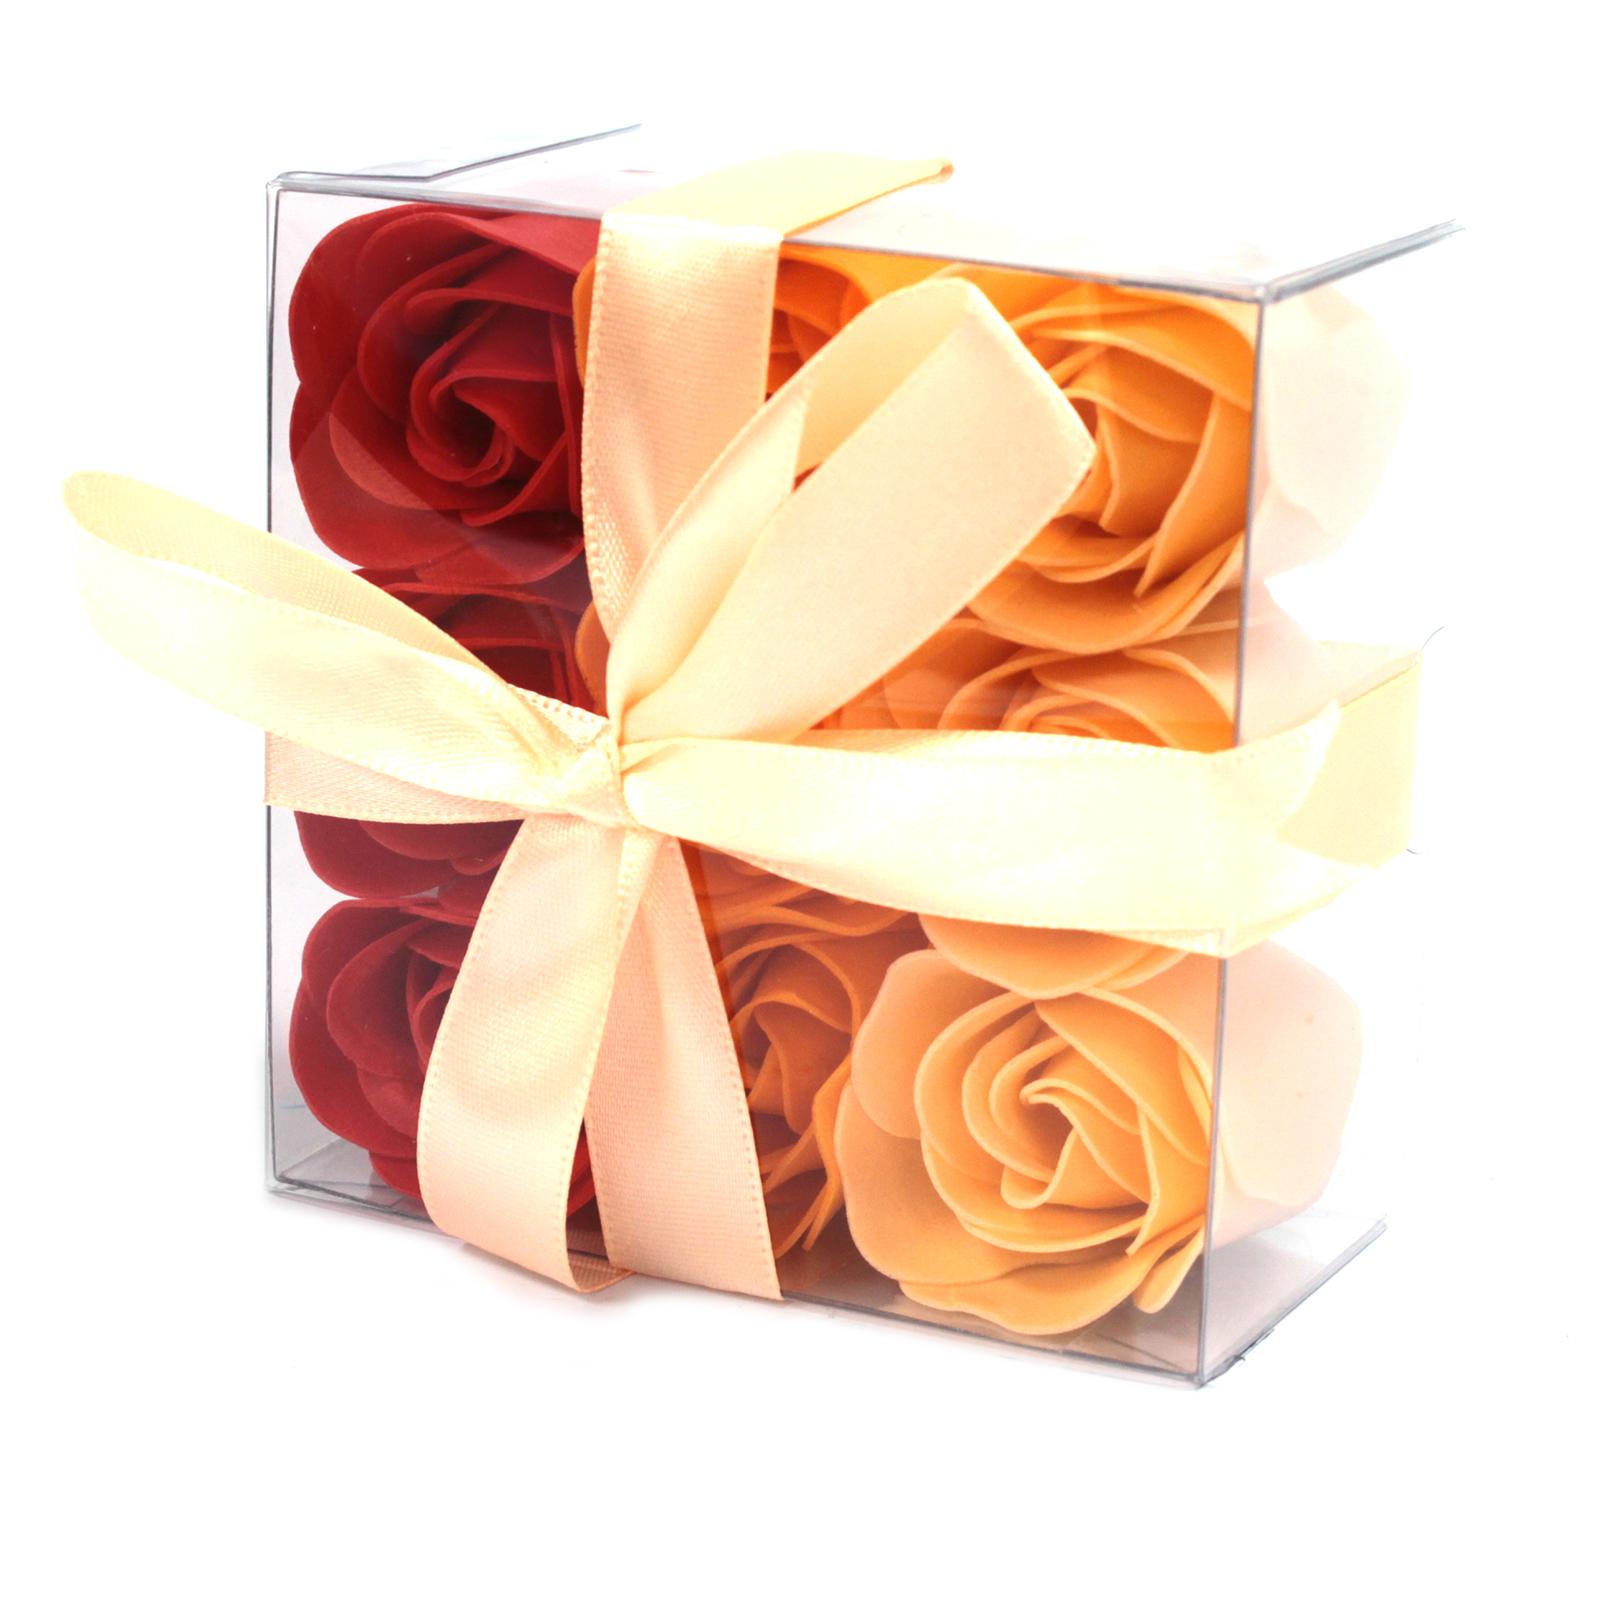 1x Set of 9 Soap Flower Box - Peach Roses